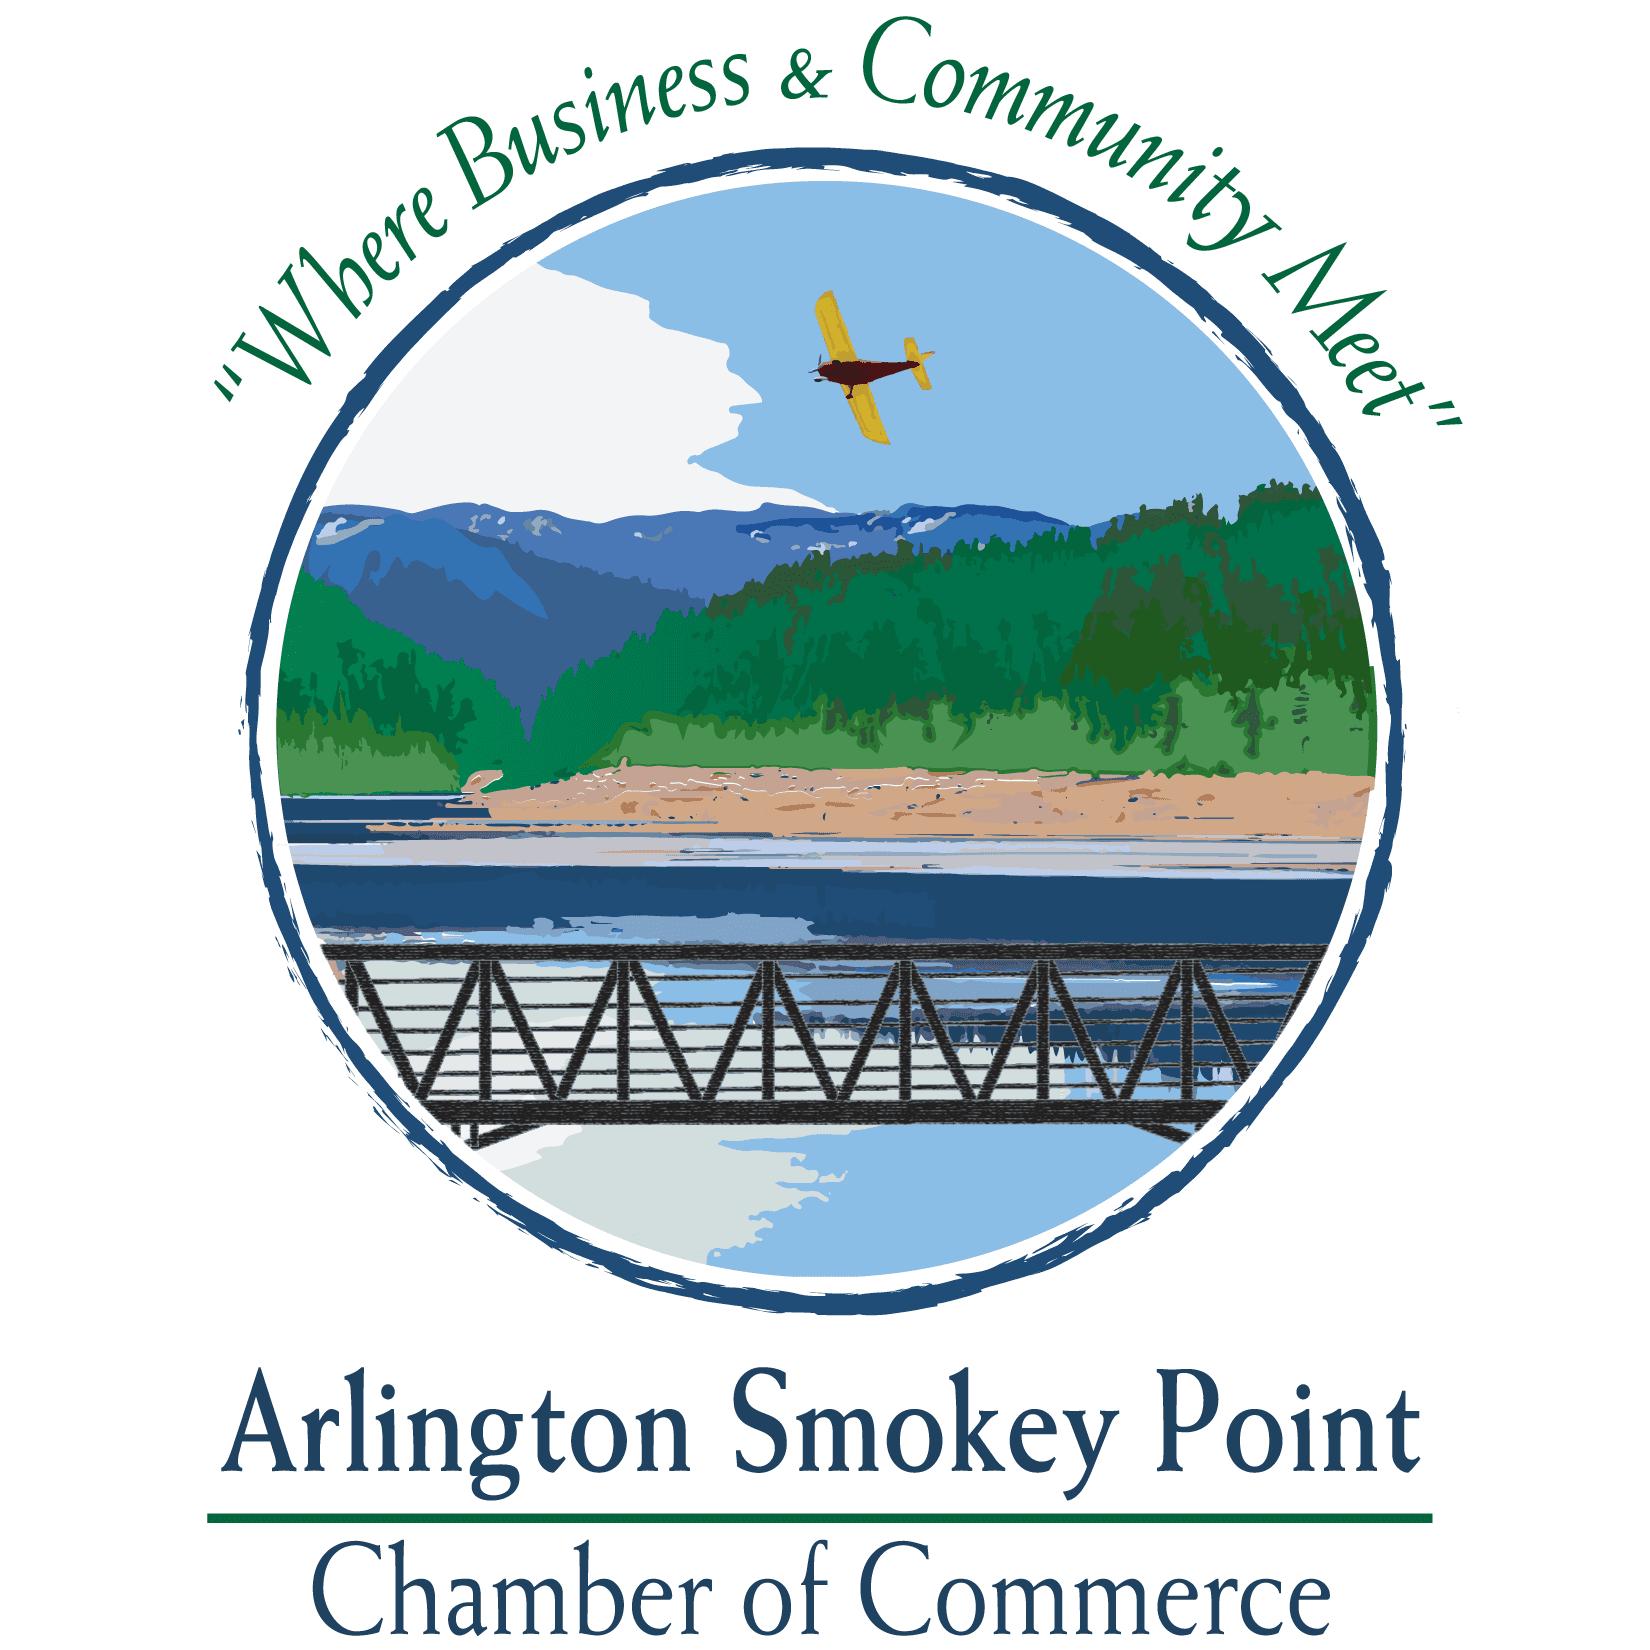 Arlington-Smokey Point Chamber of Commerce